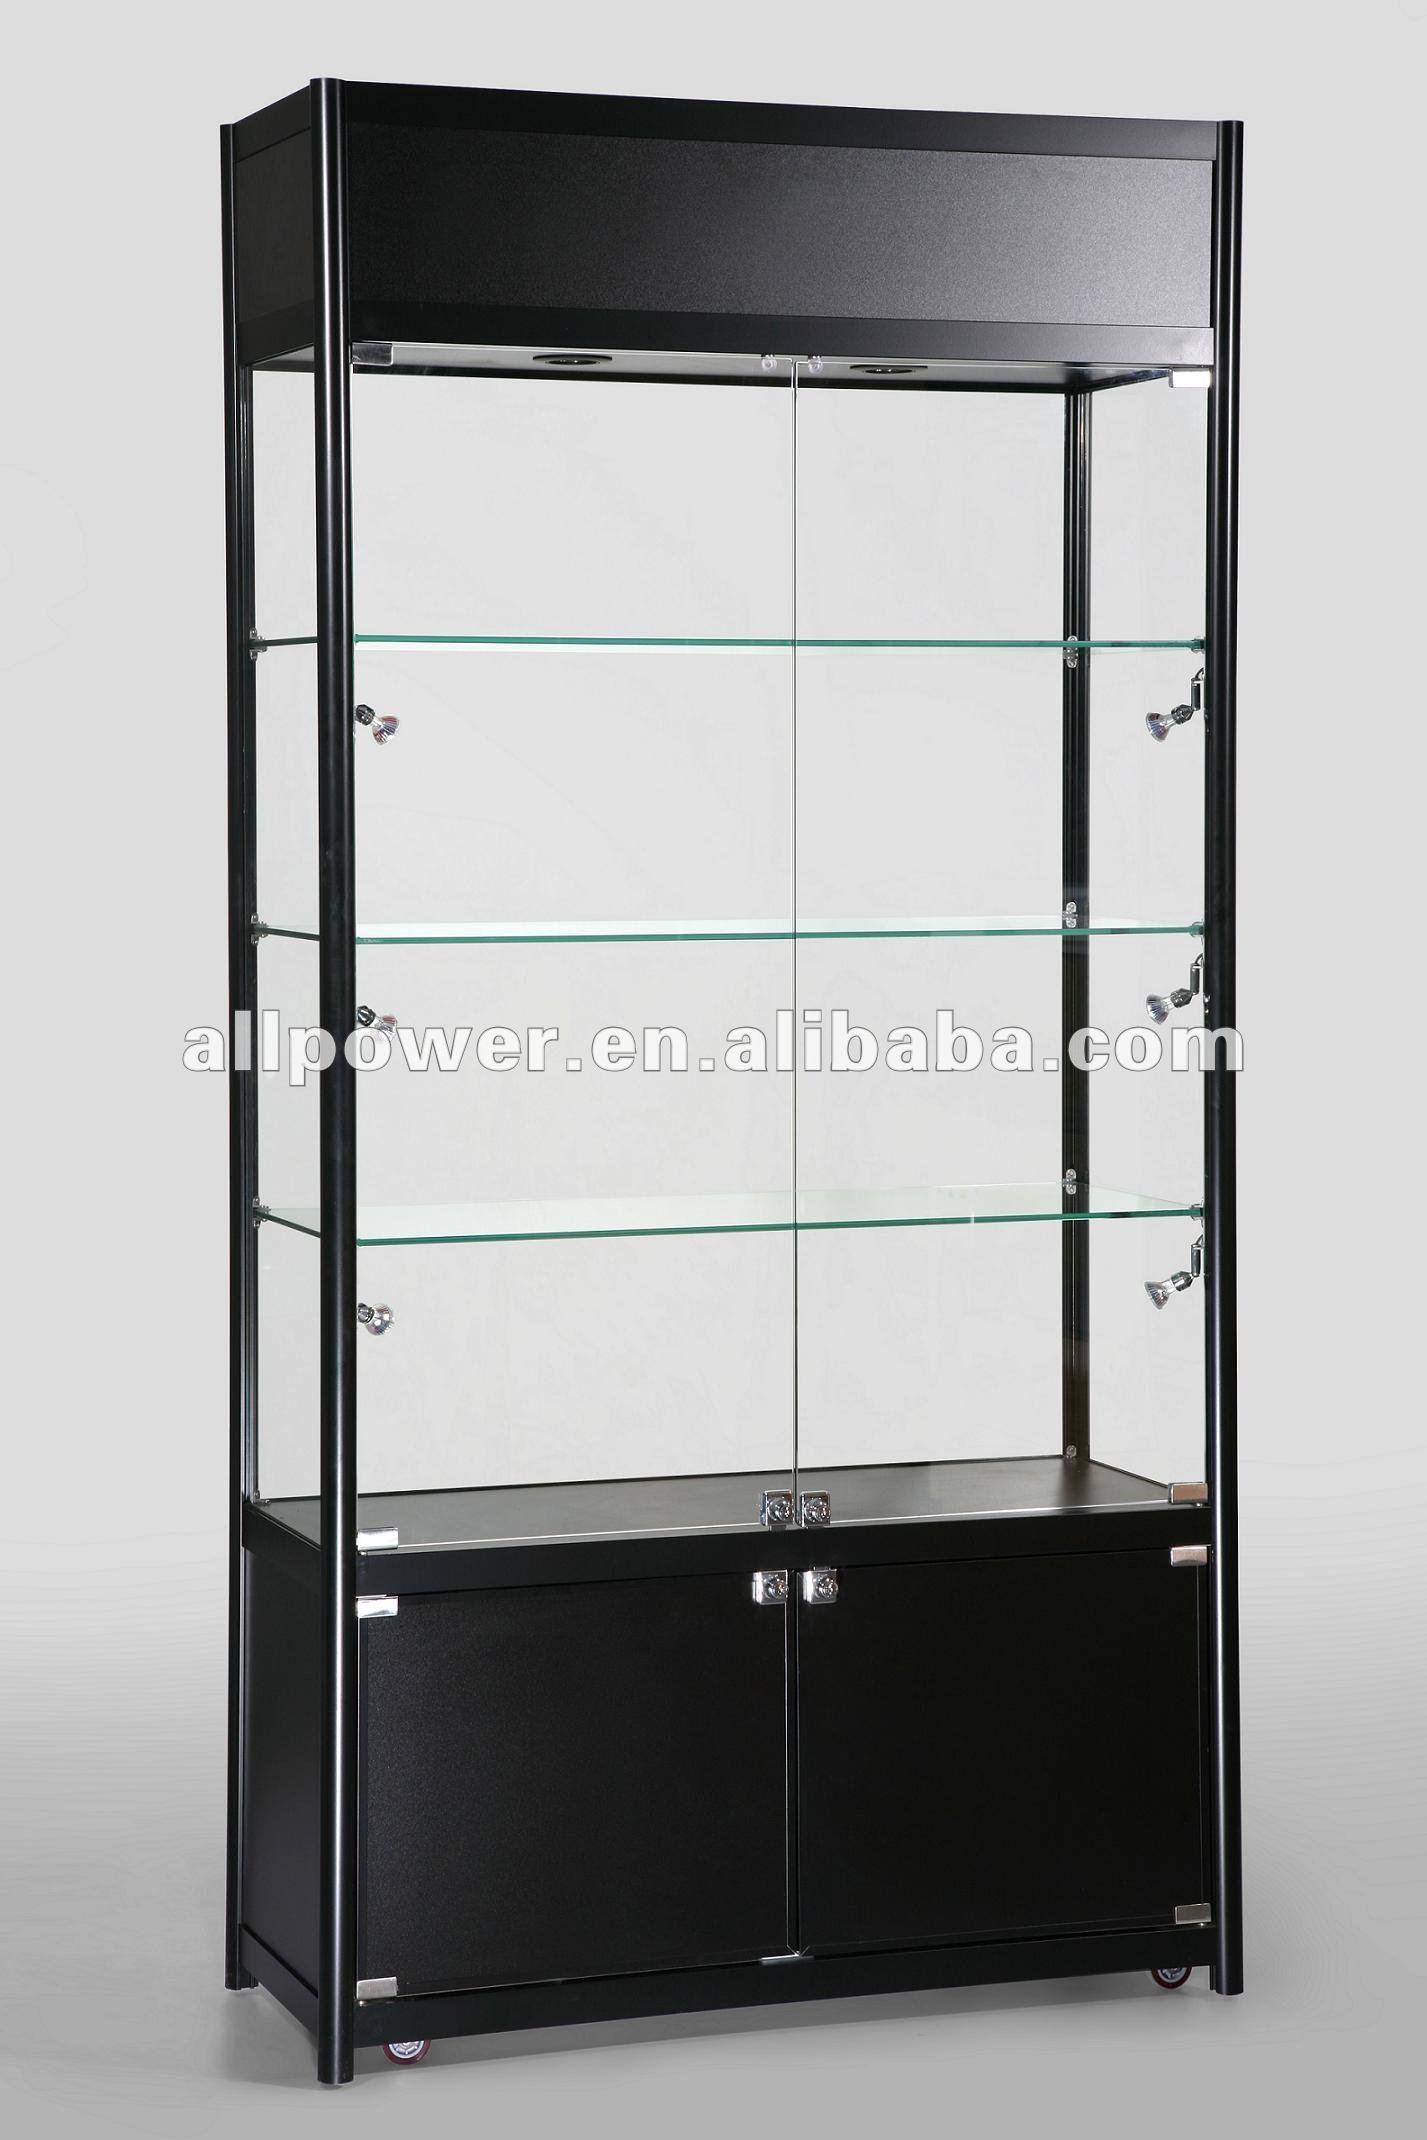 Black Gloss Mdf,Display Glass Cabinet (swc1000tc) - Buy Hobby Shop ...